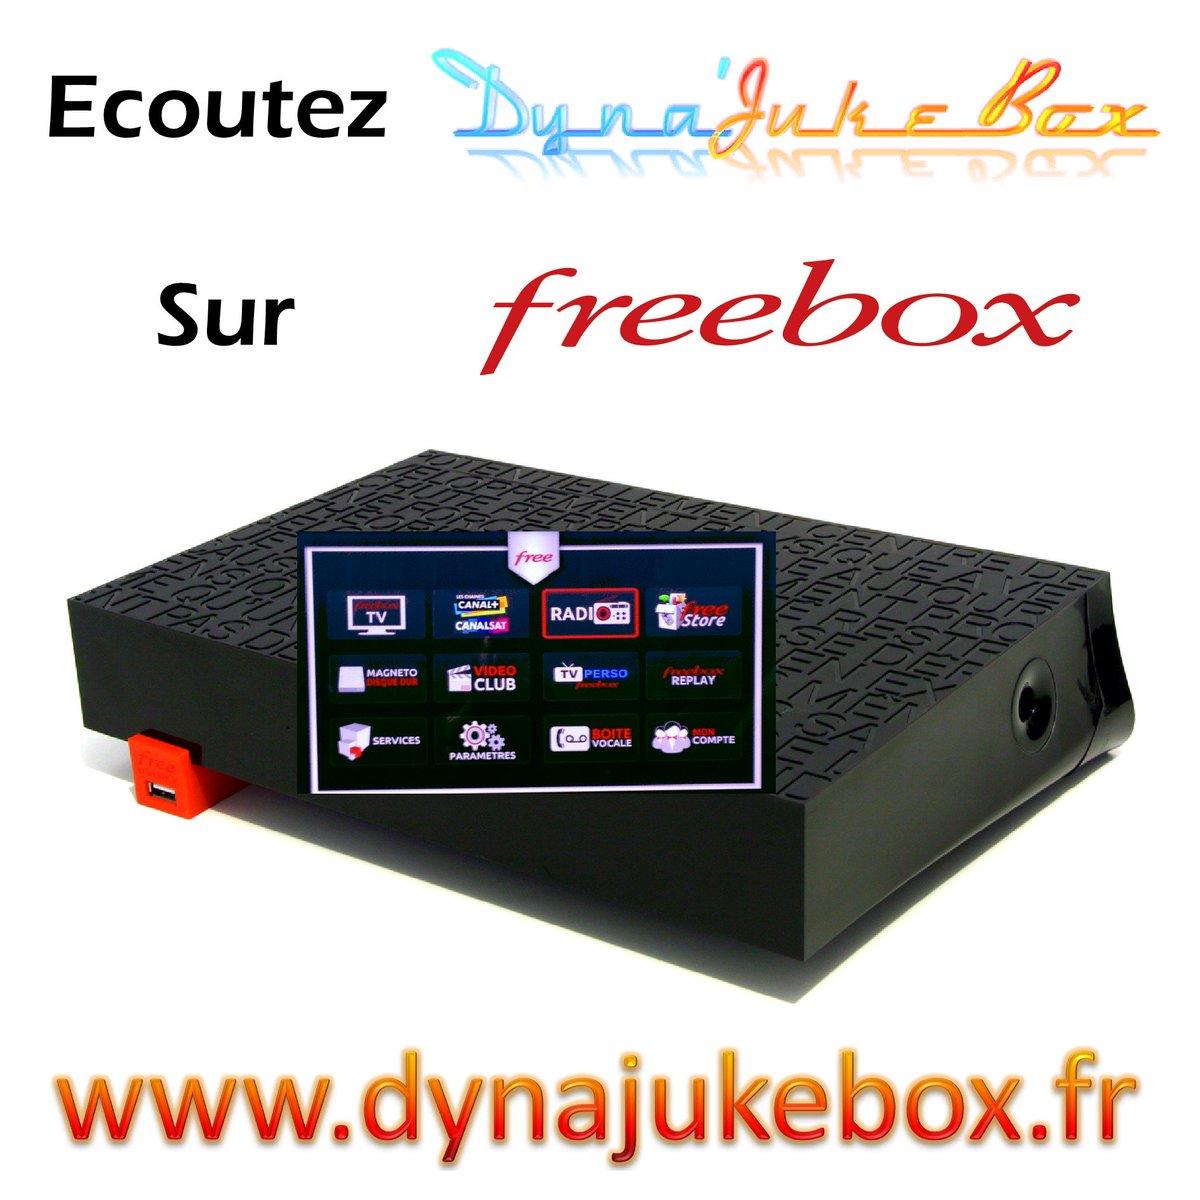 Site freebox